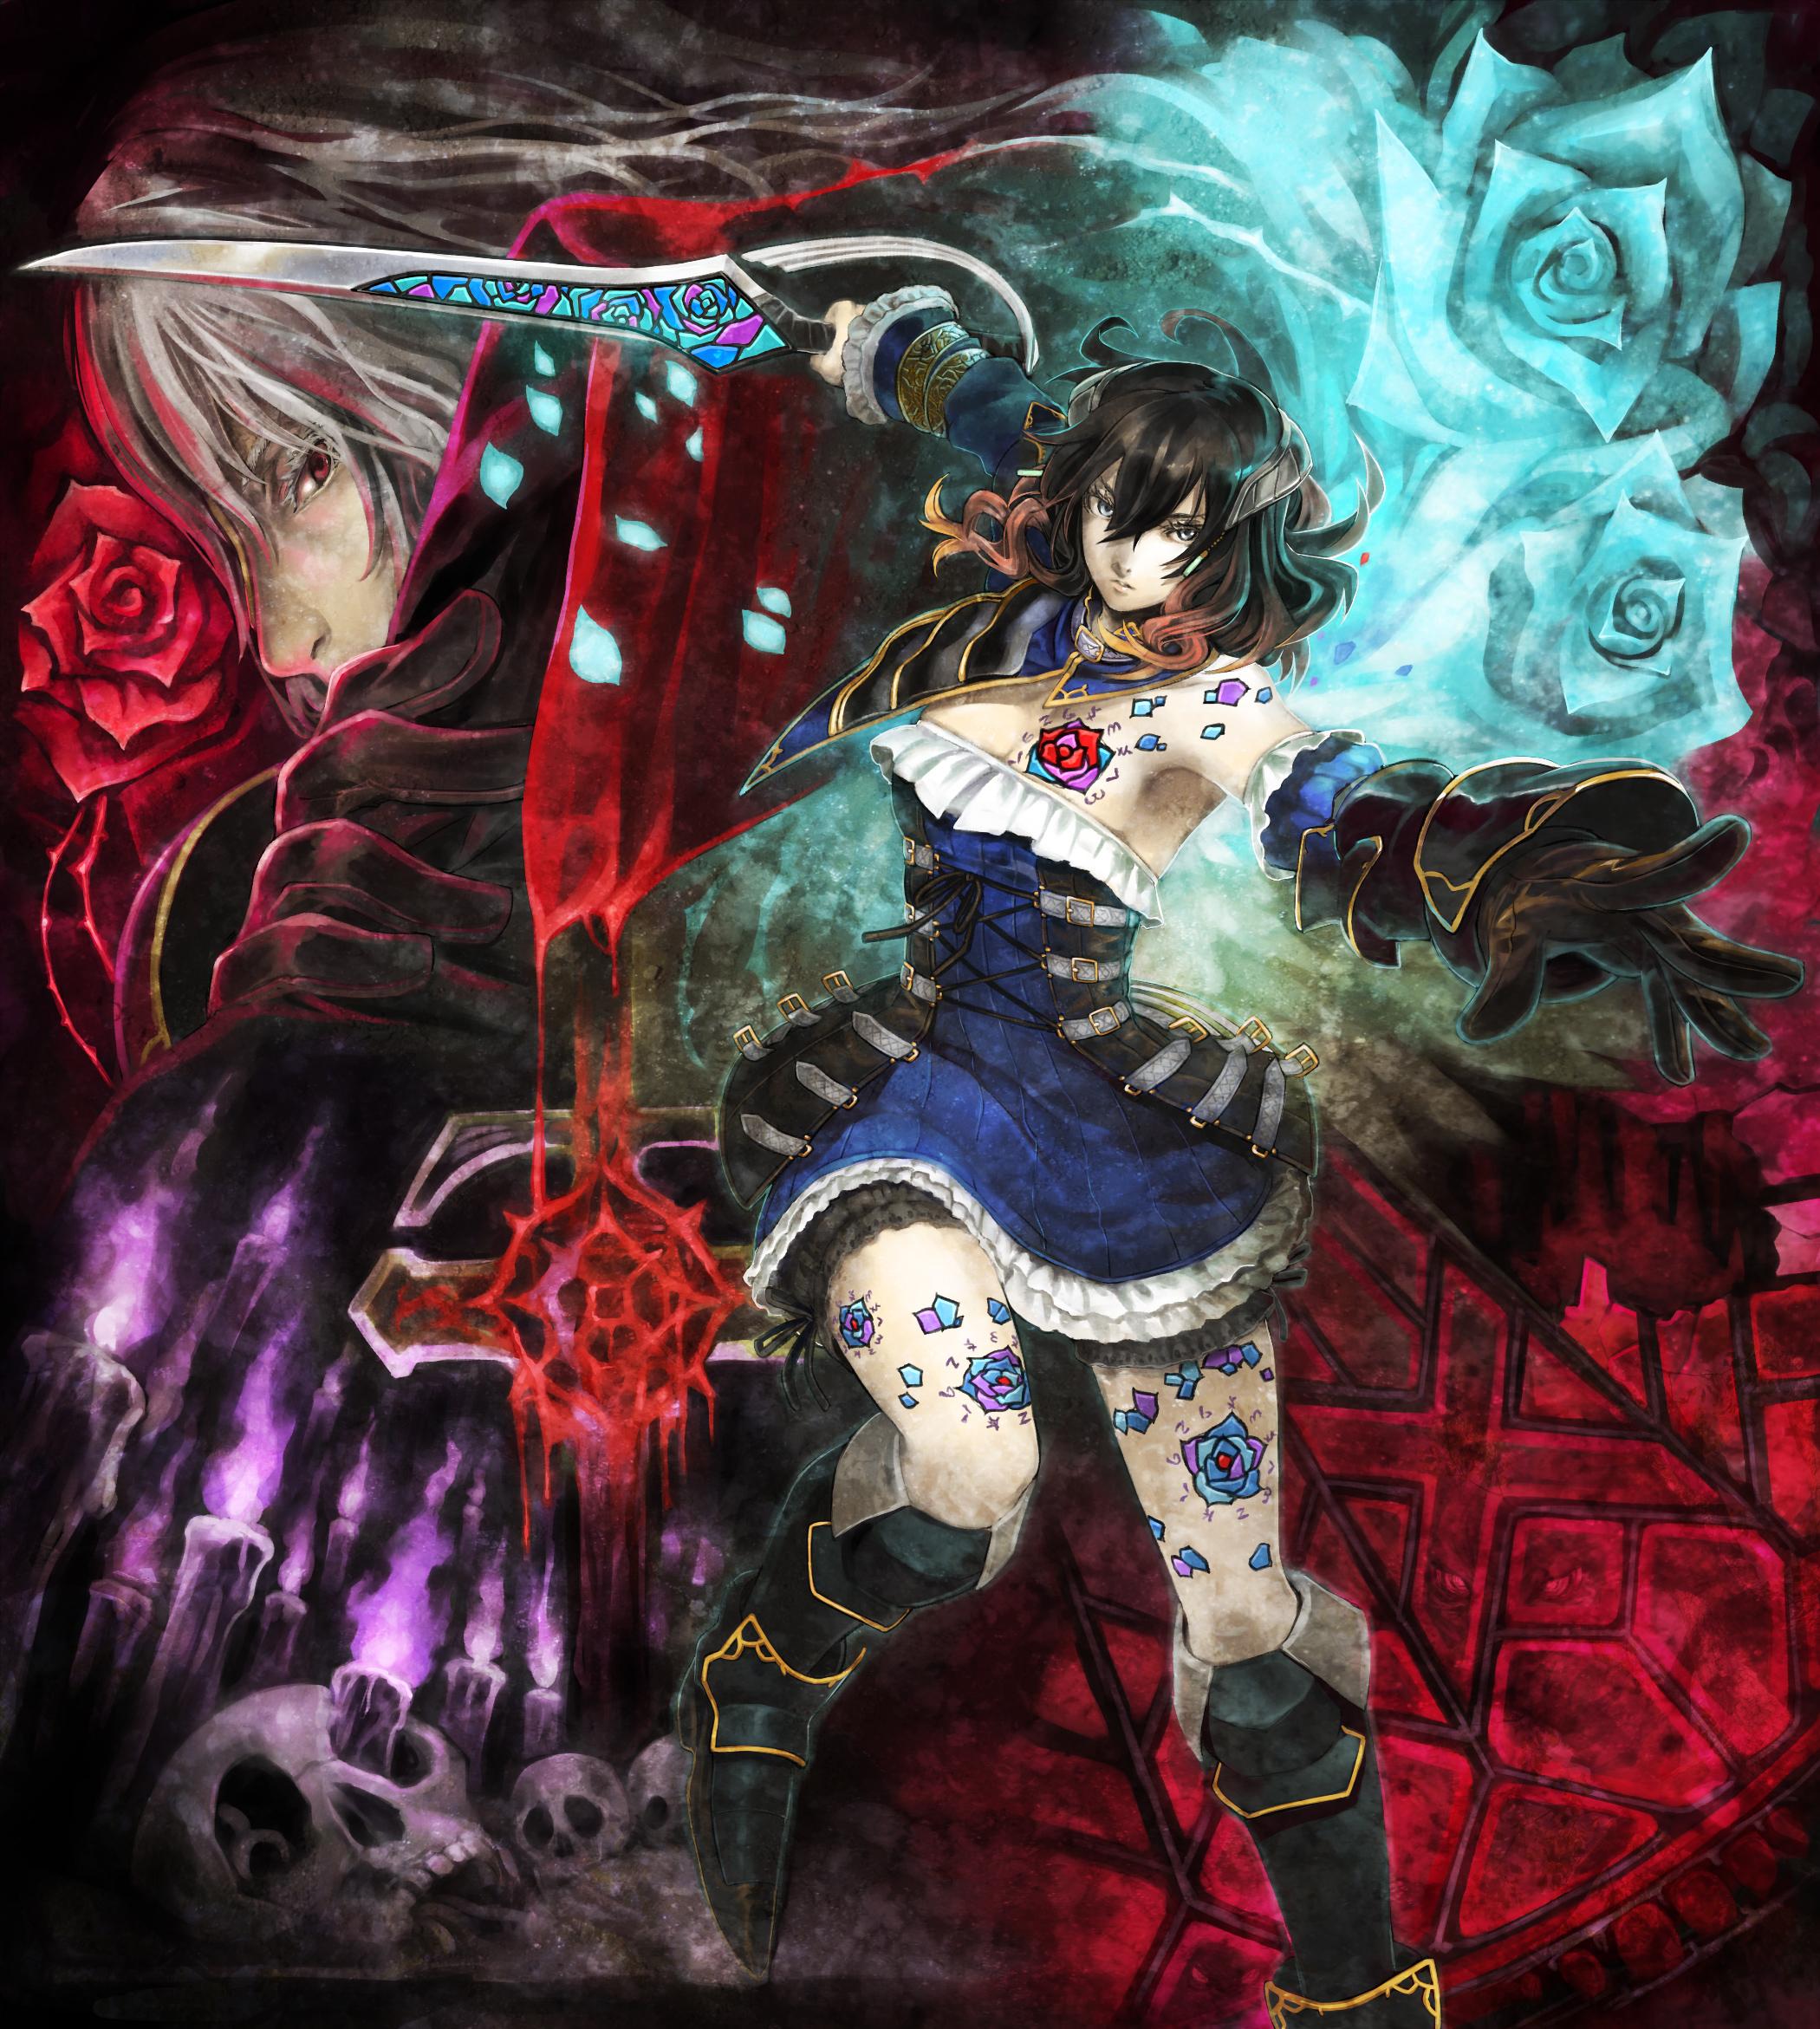 Miriam Gebel Bloodstained Wallpaper, HD Games 4K ...